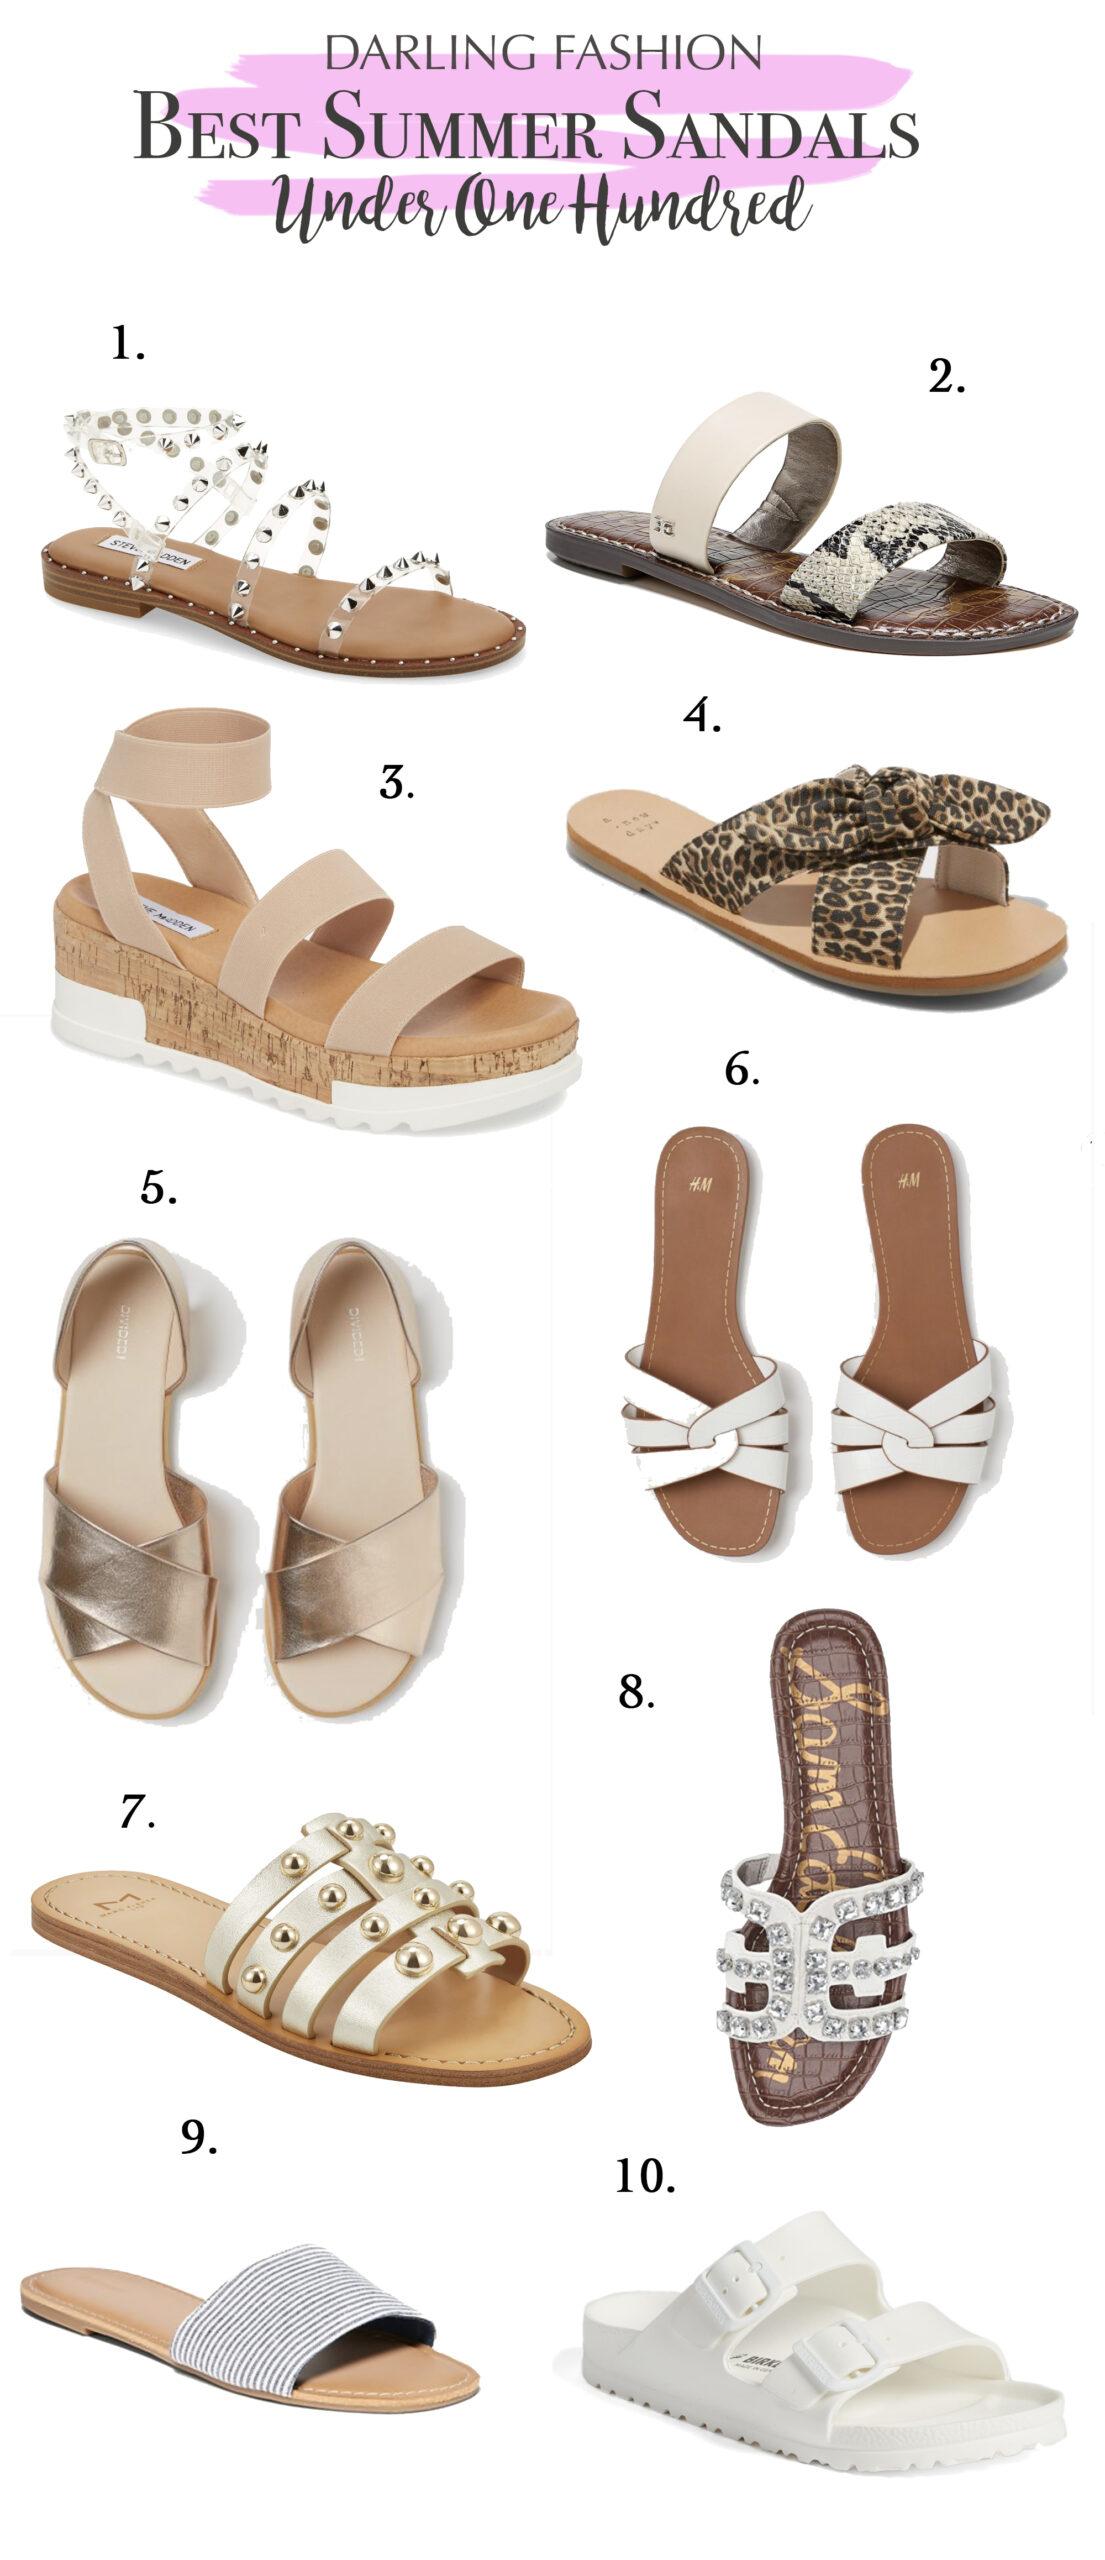 Best Summer Sandals - Darling Darleen